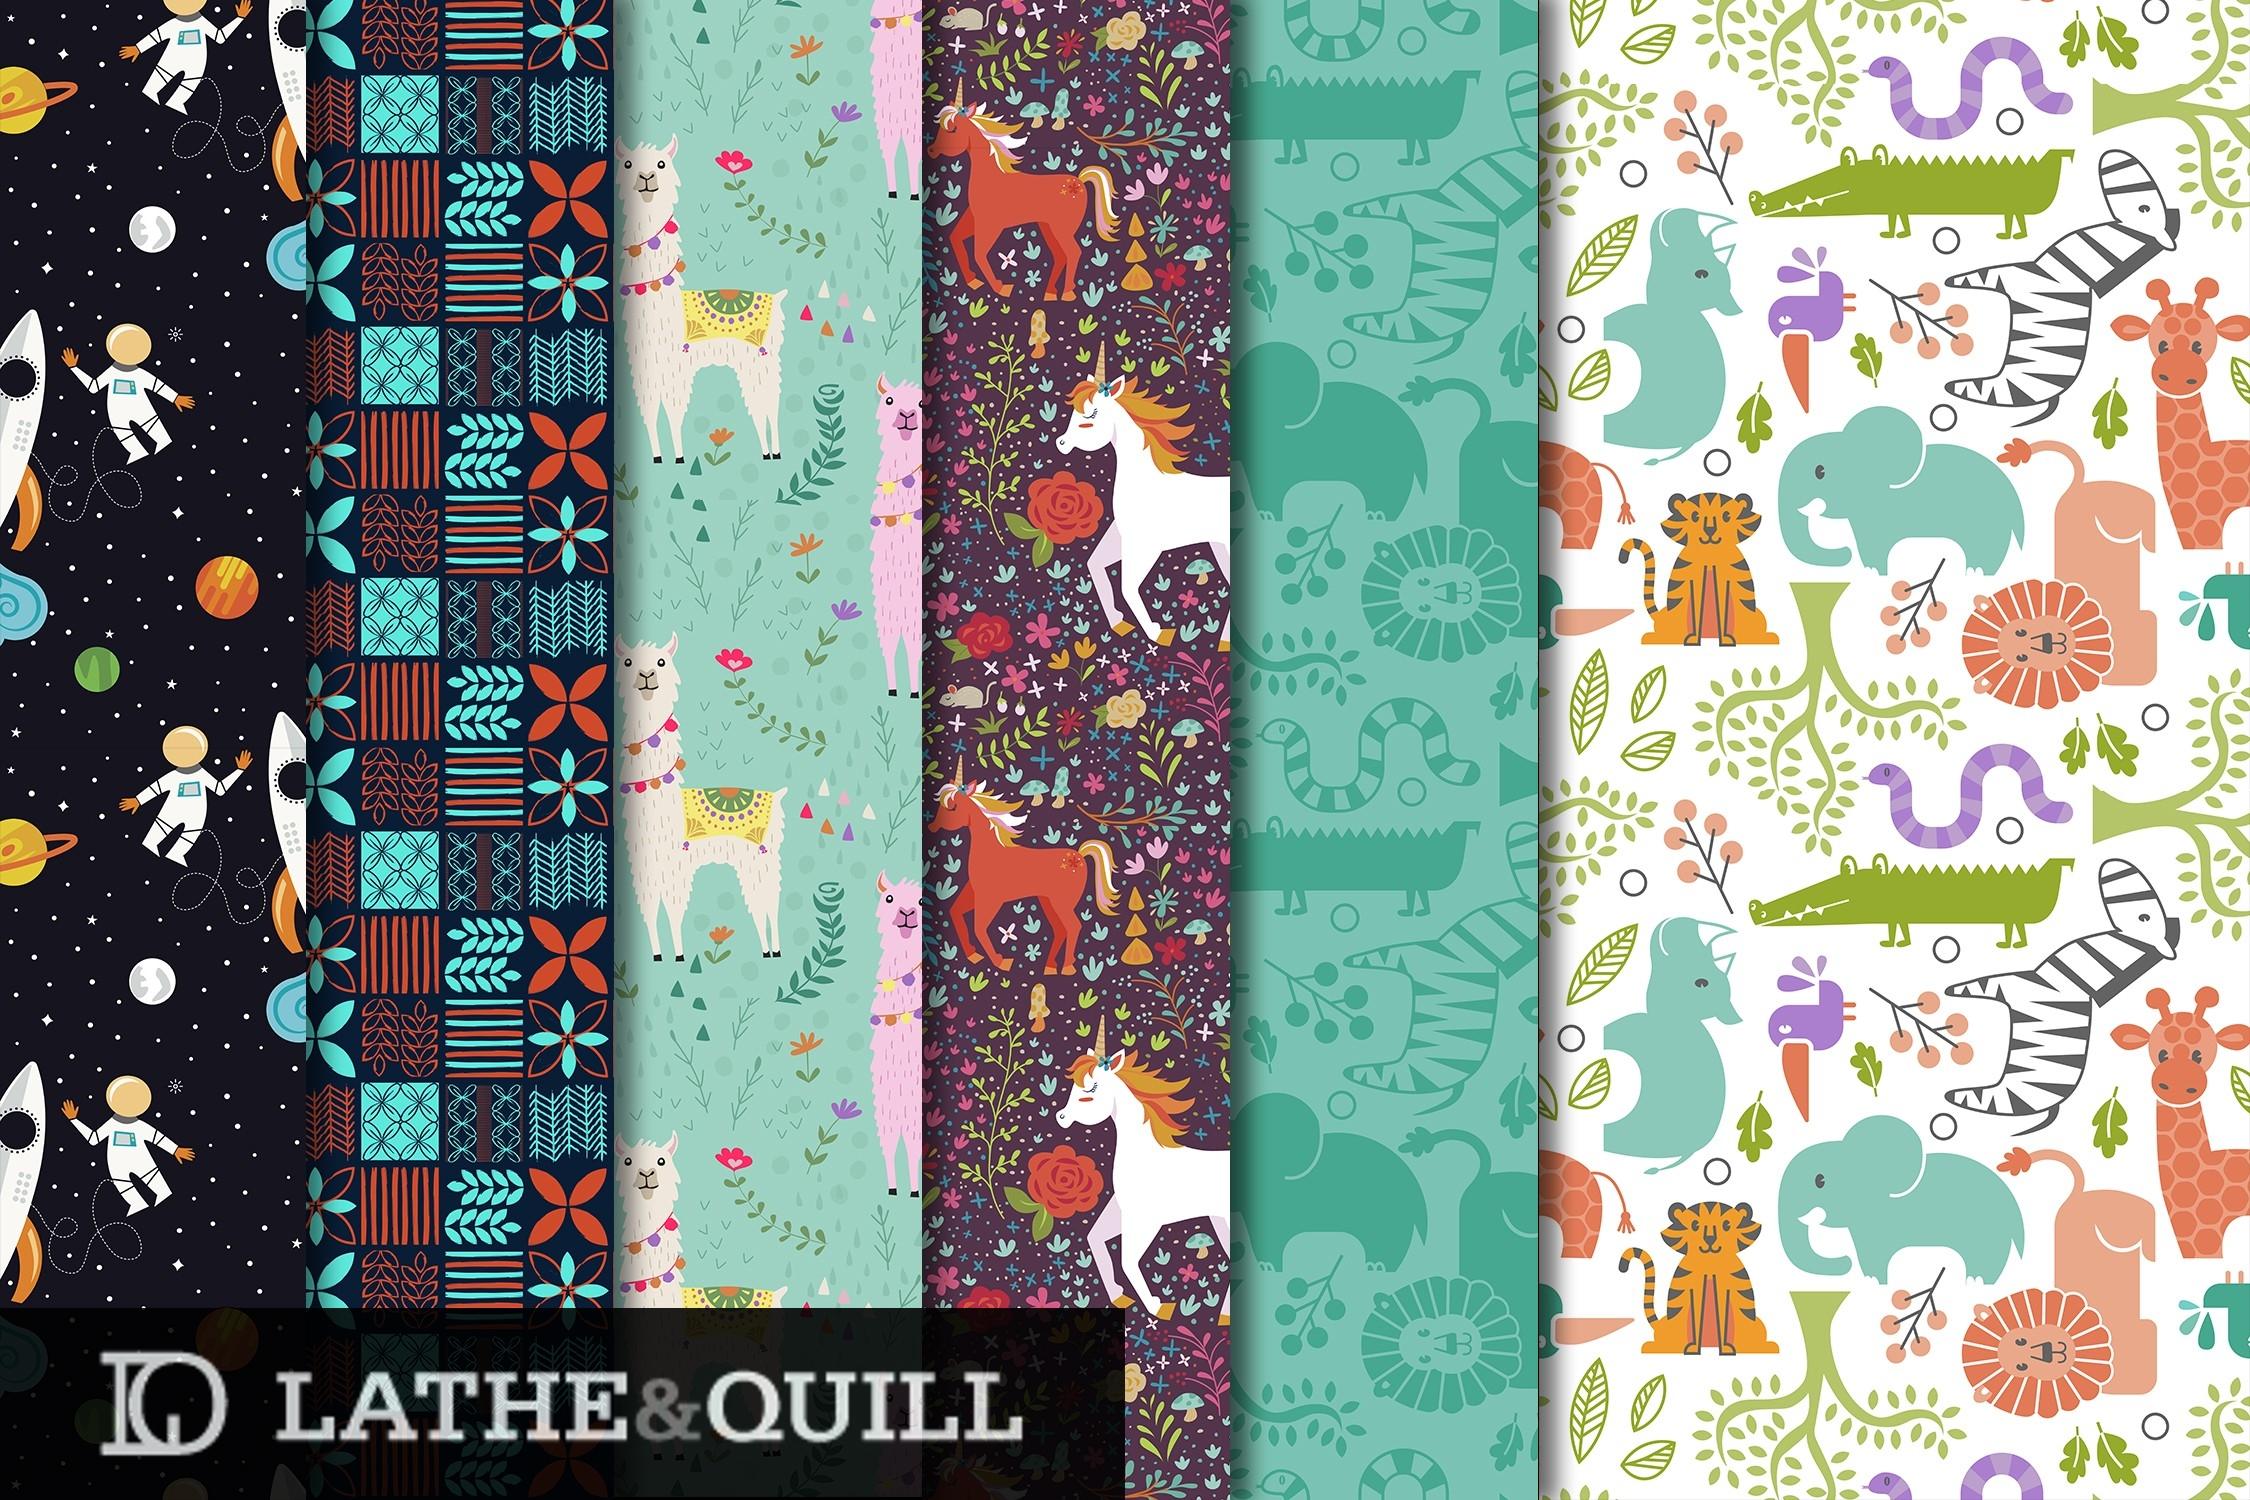 fun patterns for children's room